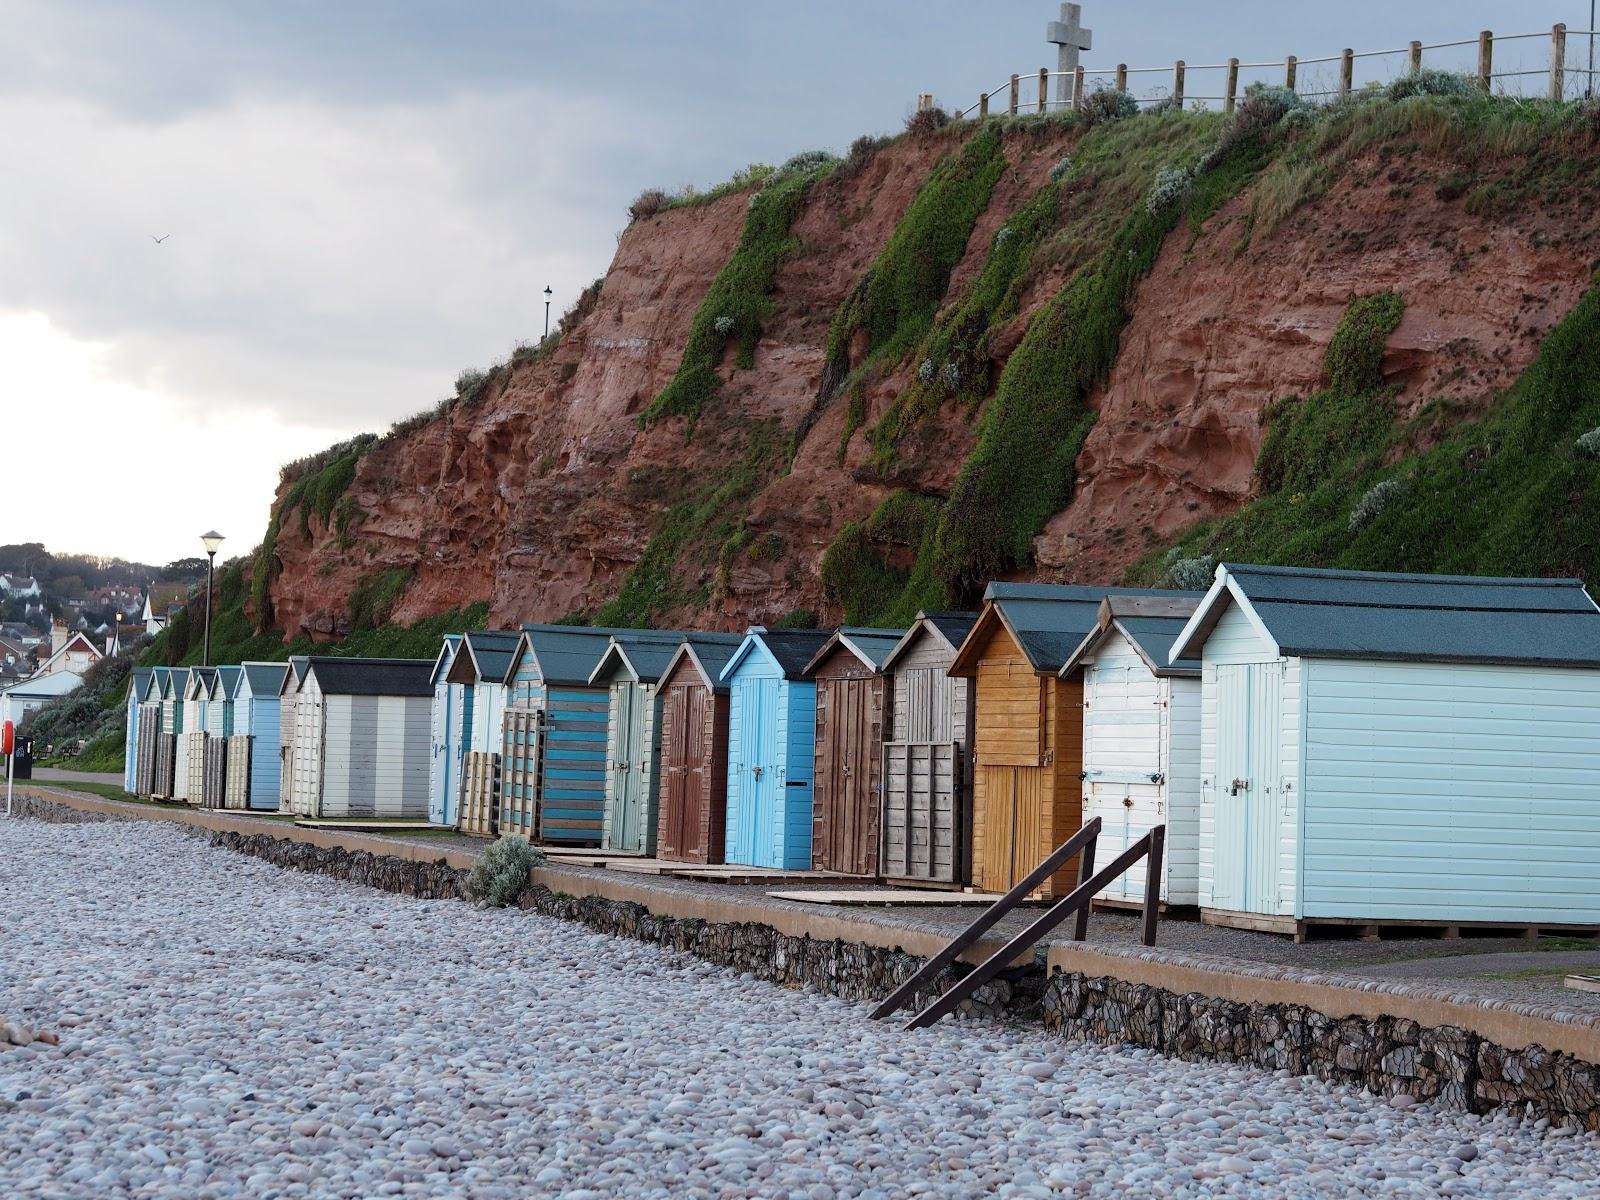 Beach huts on Budleigh Beach, Devon